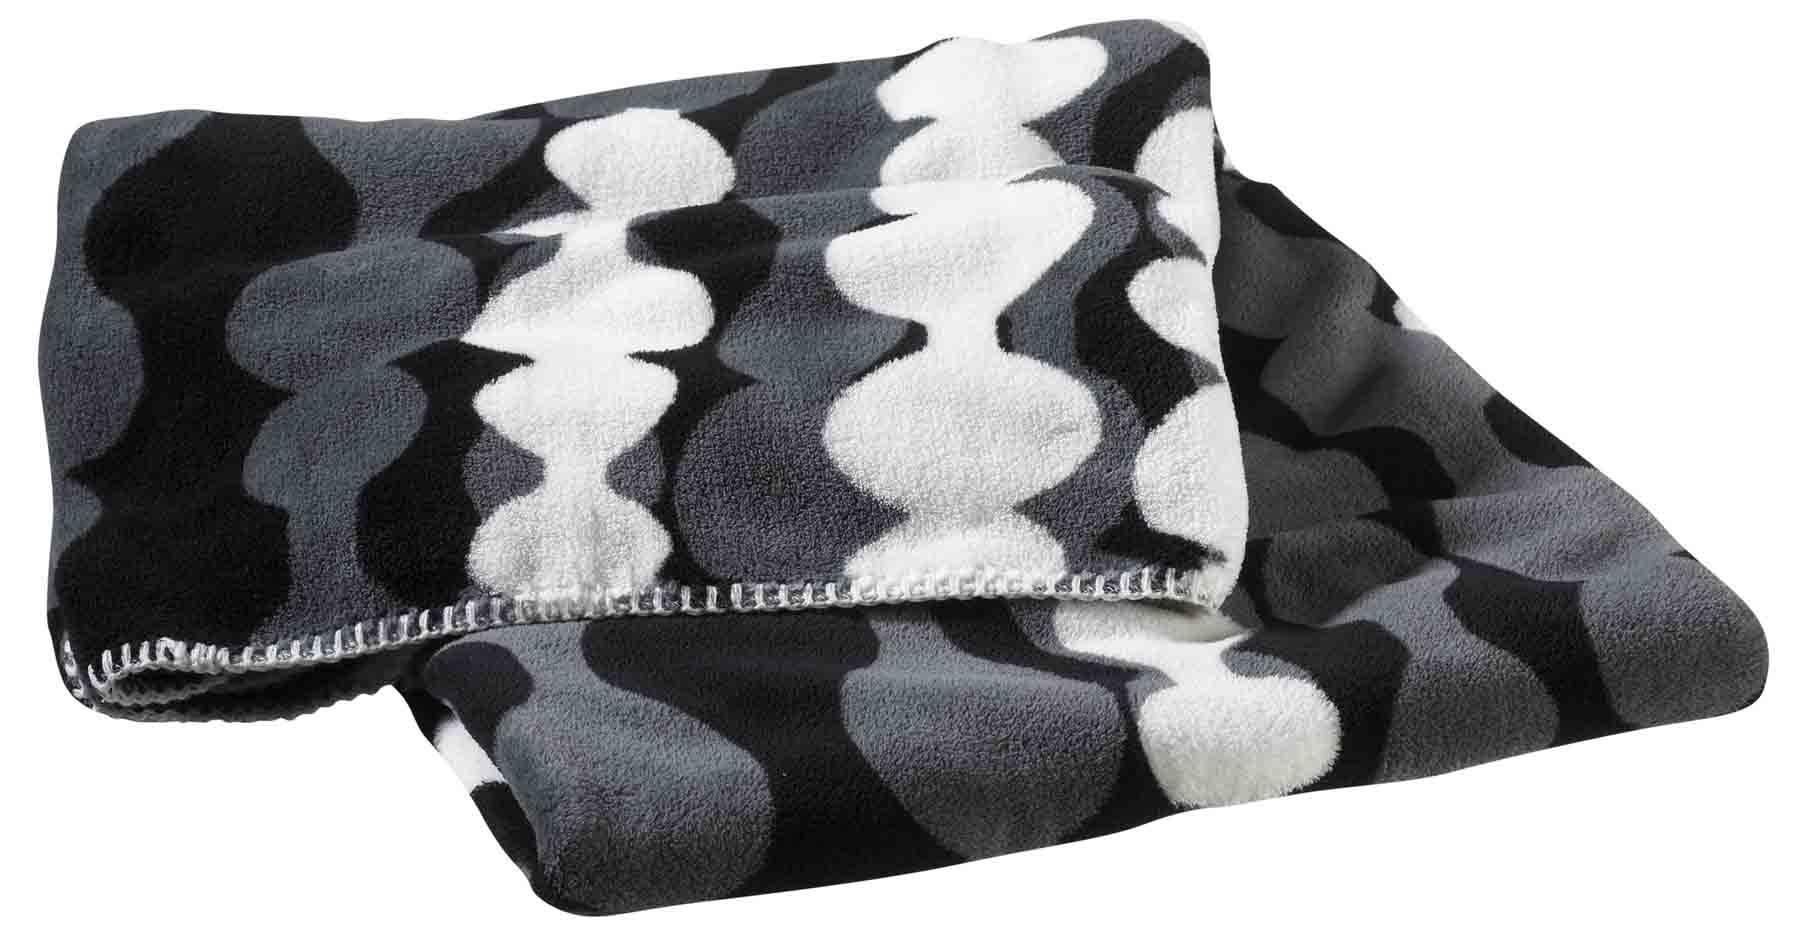 Coral blanket,blanket factory,coral blanket supplier,coral blanket factory,printed coral blanket,hom